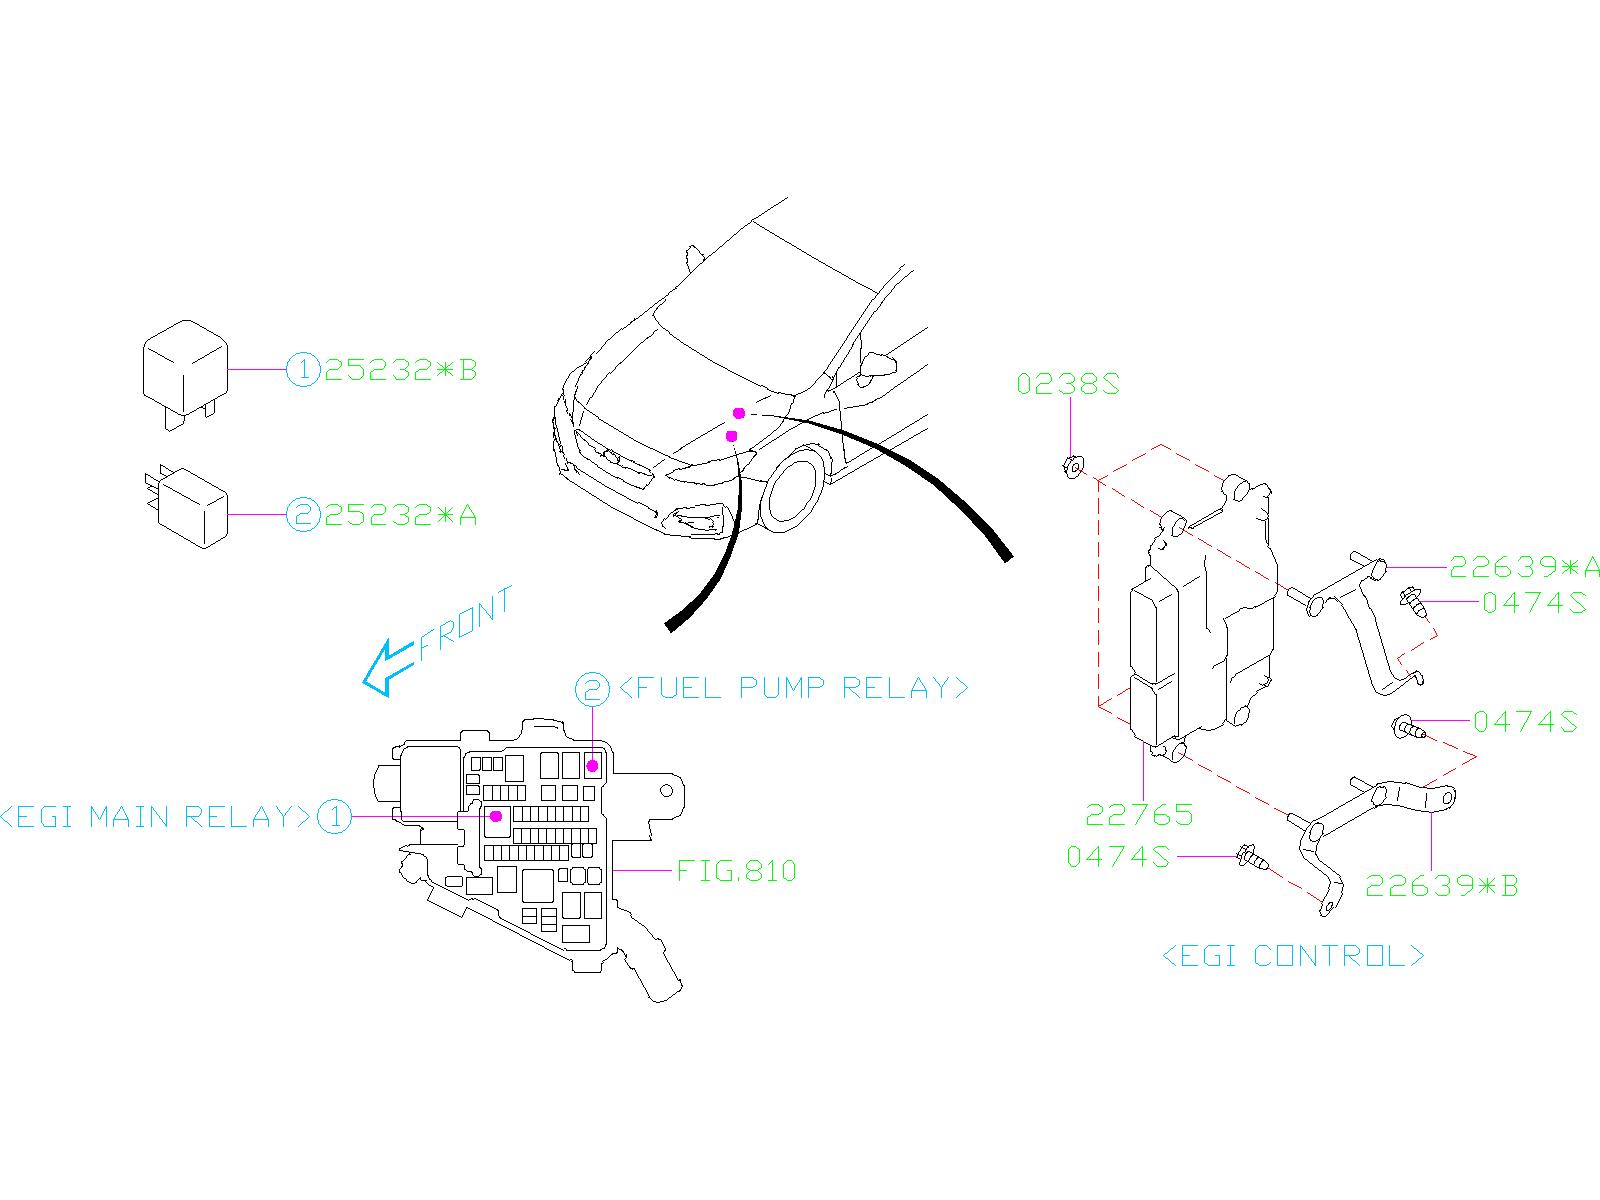 2015 subaru outback limited 2 5l cvt relay  sensor  engine